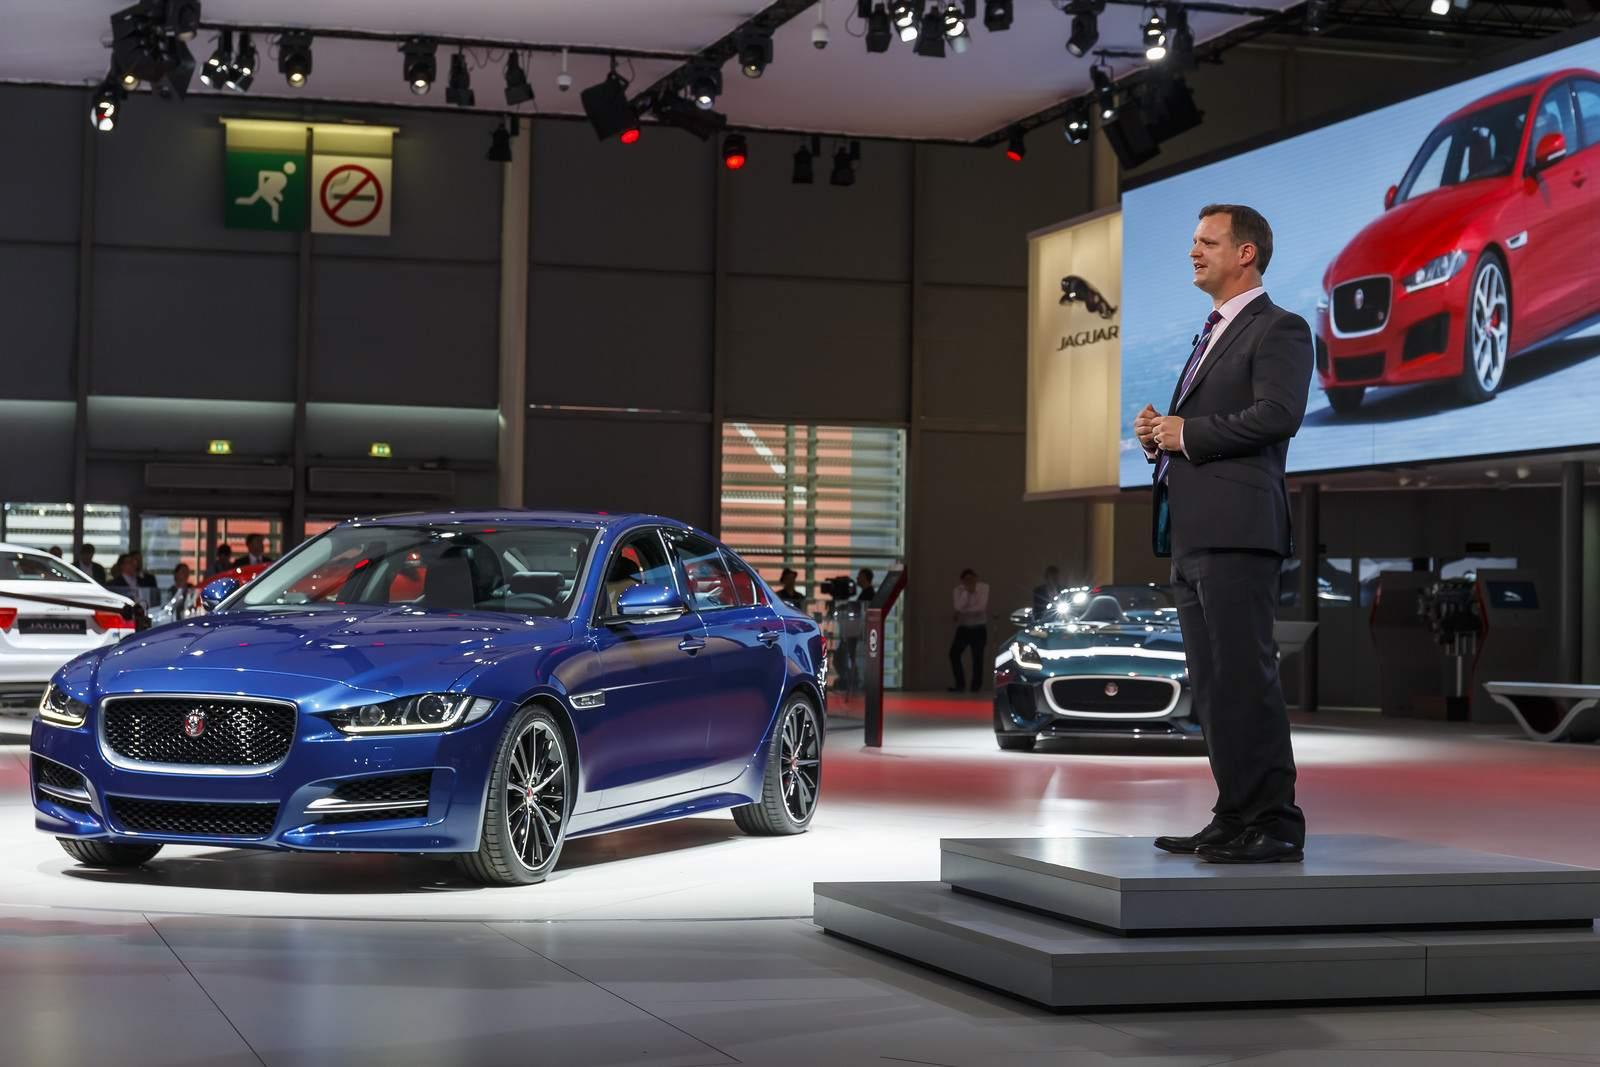 paris motor show7 Jaguar and Land Rover at Paris Auto Show 2014